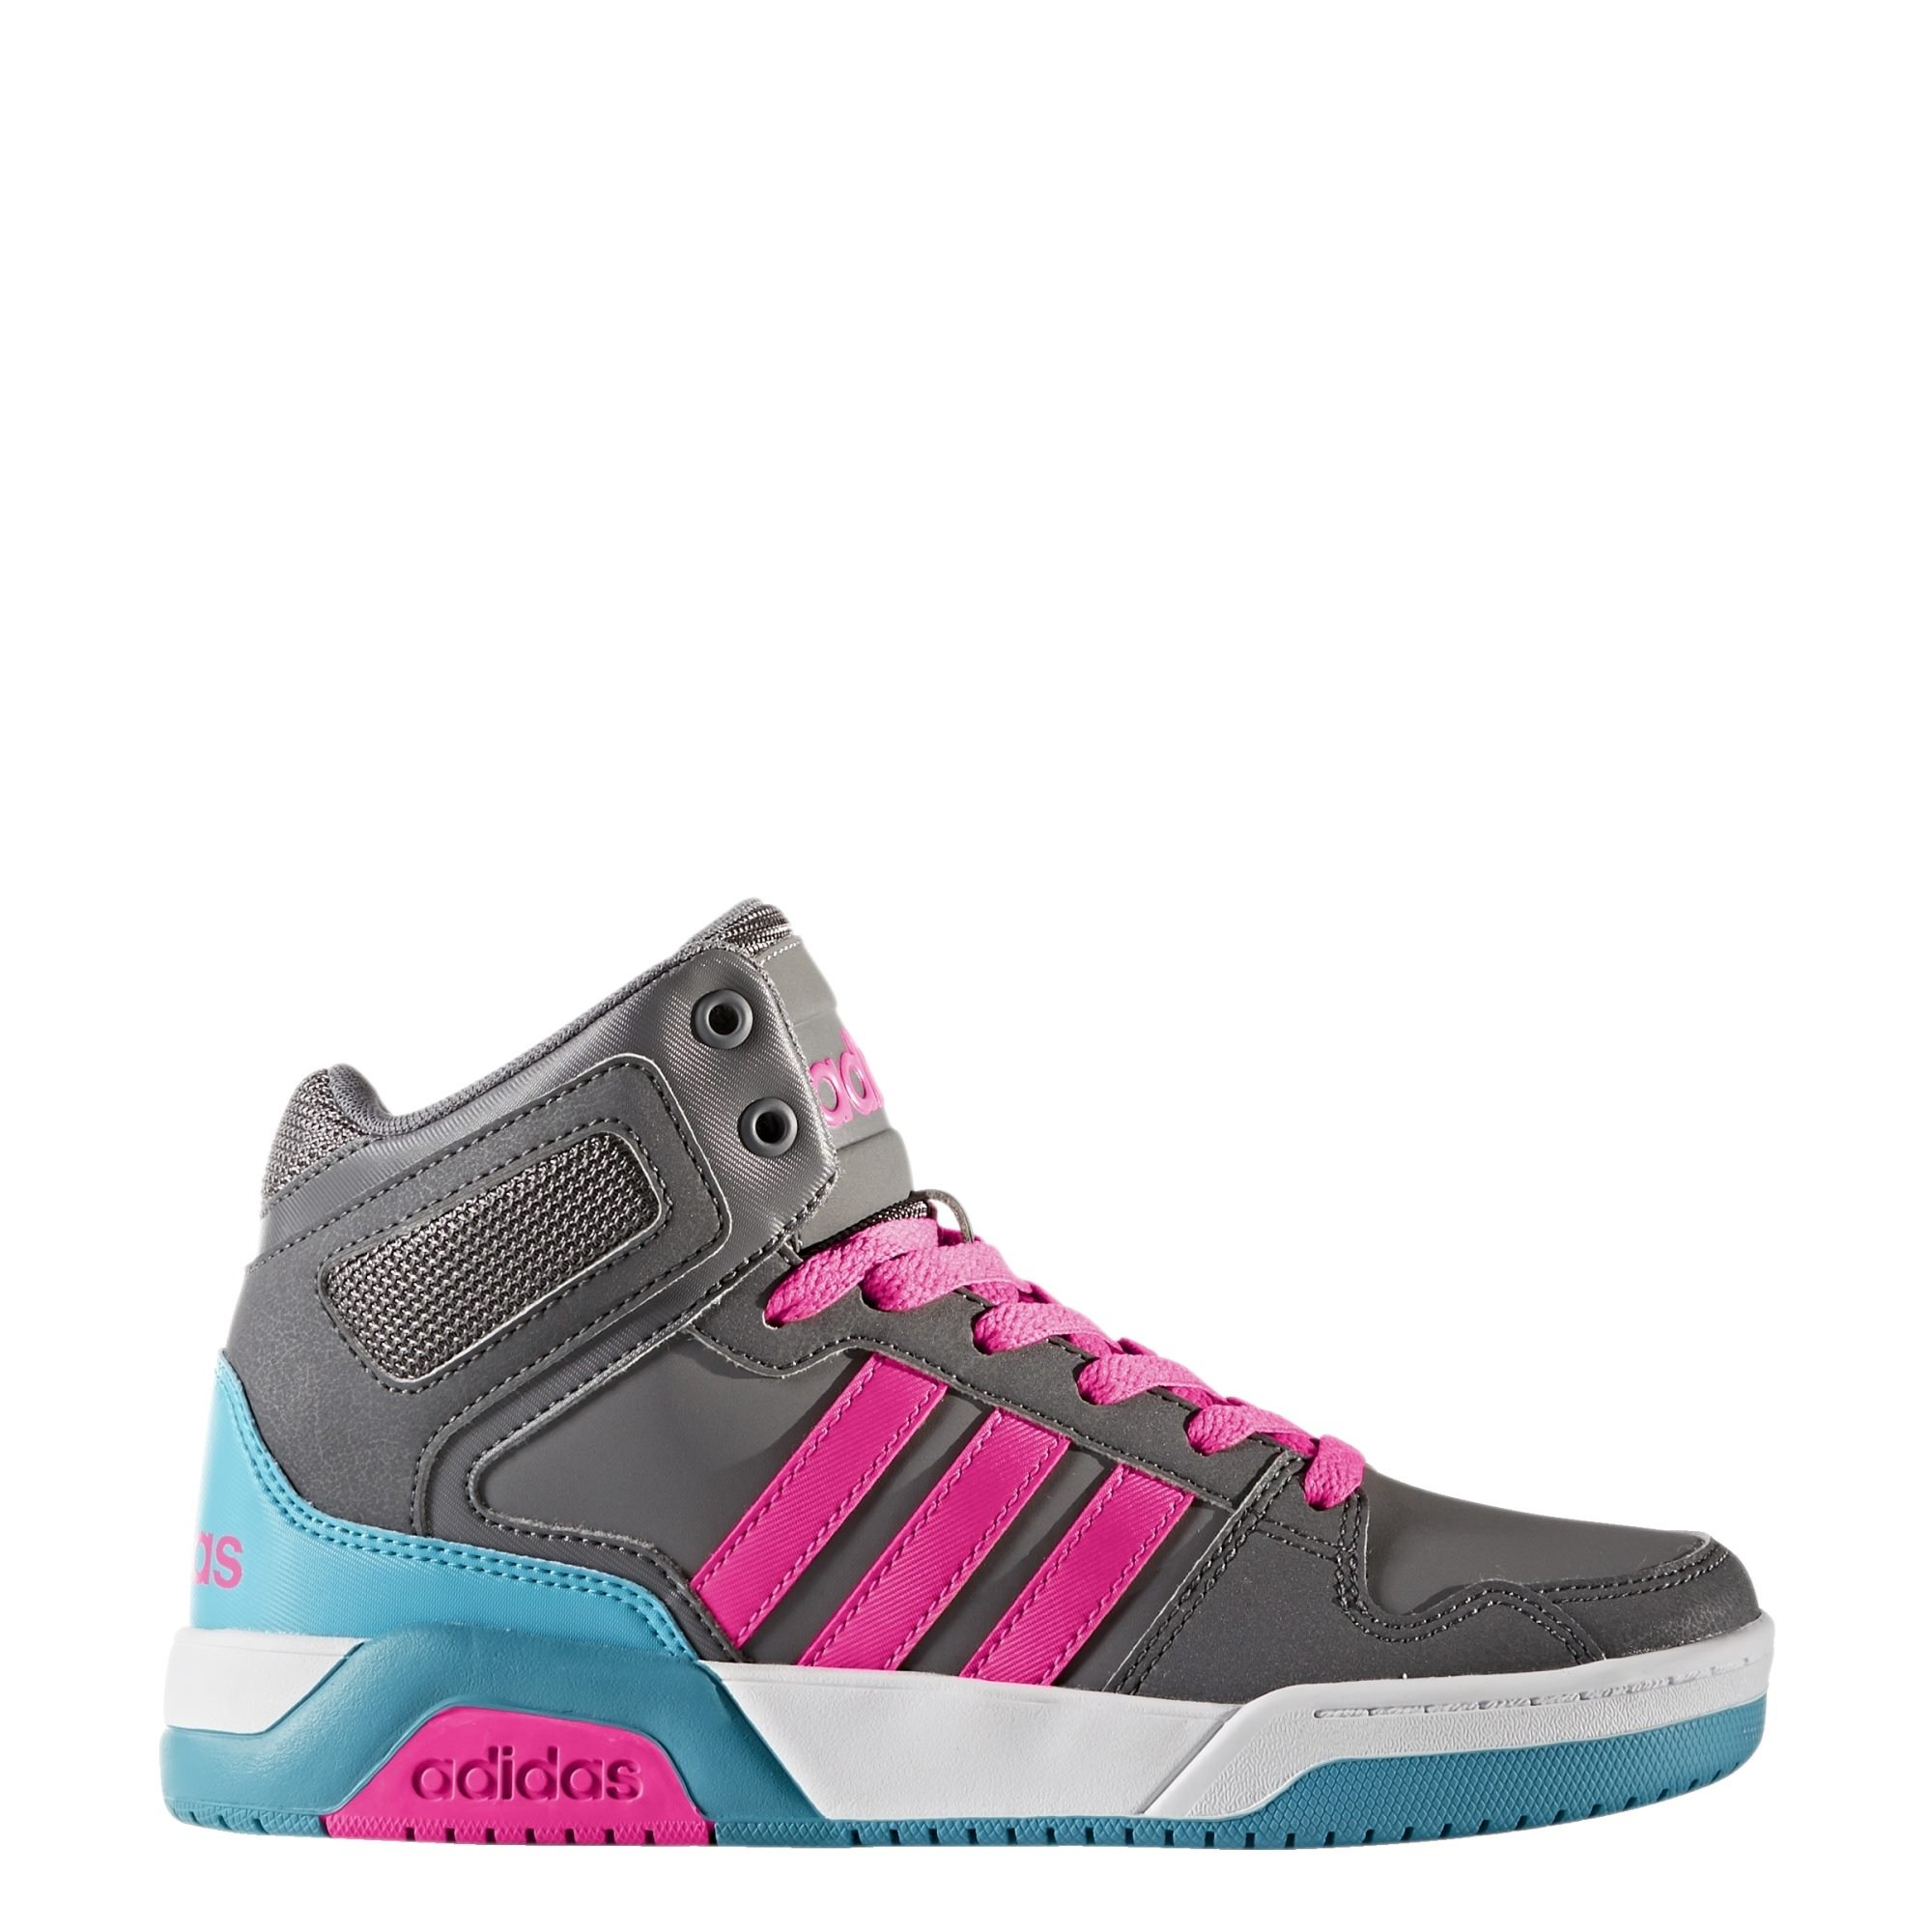 Adidas BB9Tis Mid K Meisjes schoenen